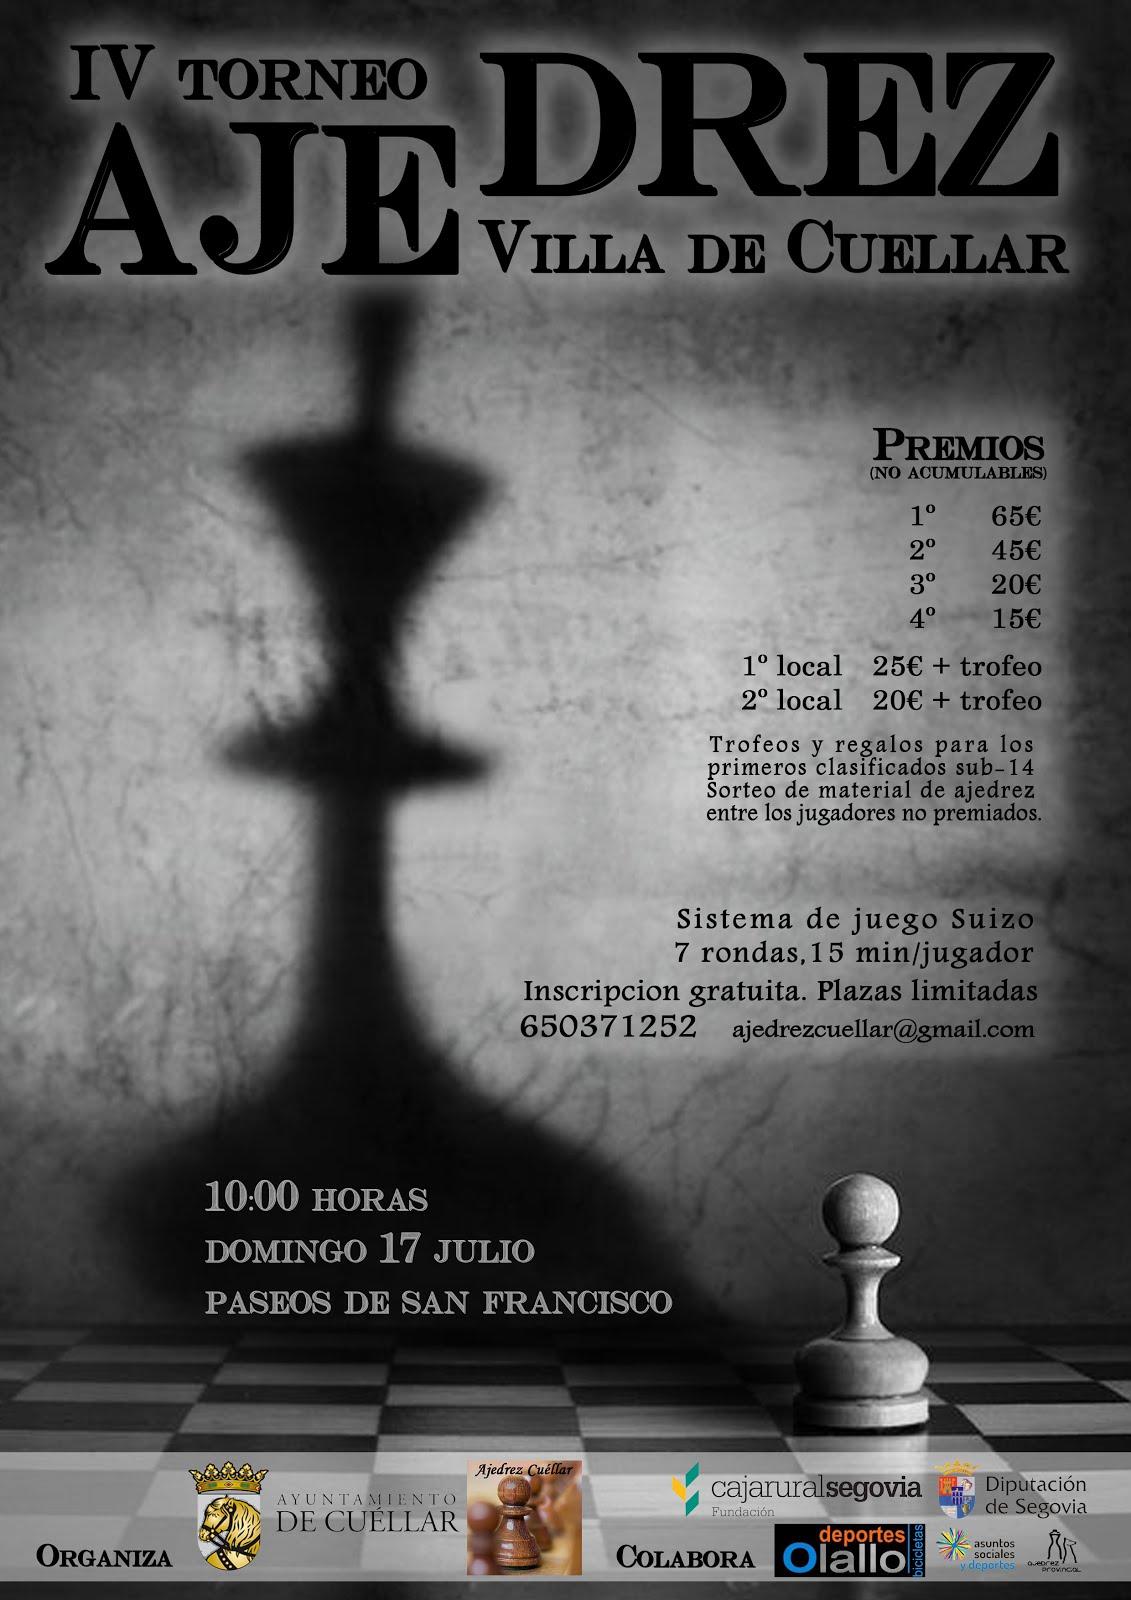 IV Torneo 'Villa de Cuéllar'